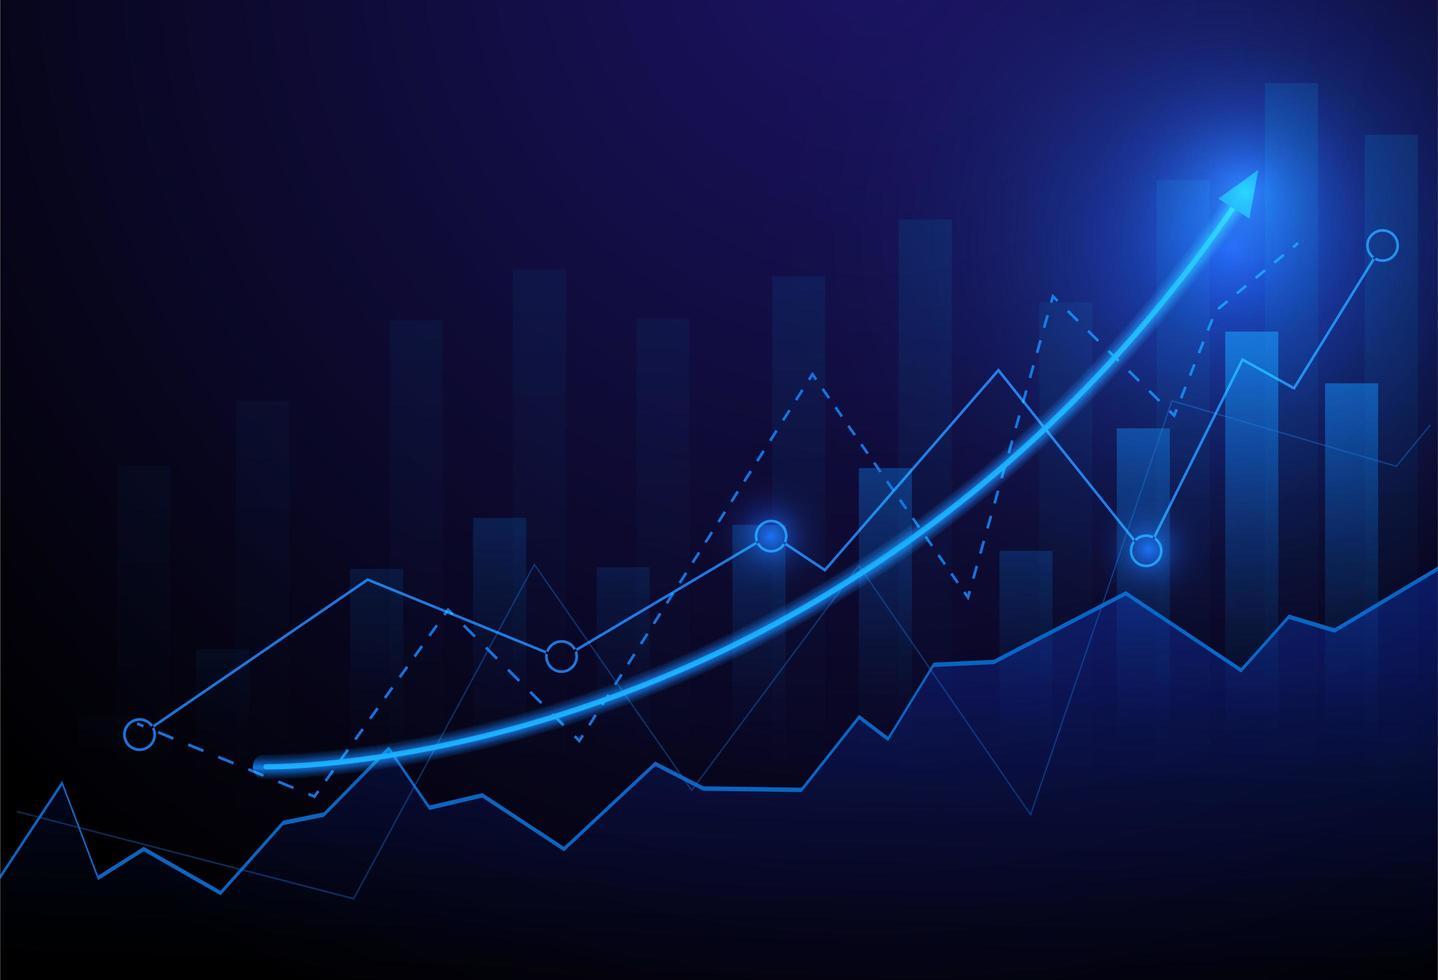 Geschäftskerzenhalter-Diagrammdiagramm der Börse vektor